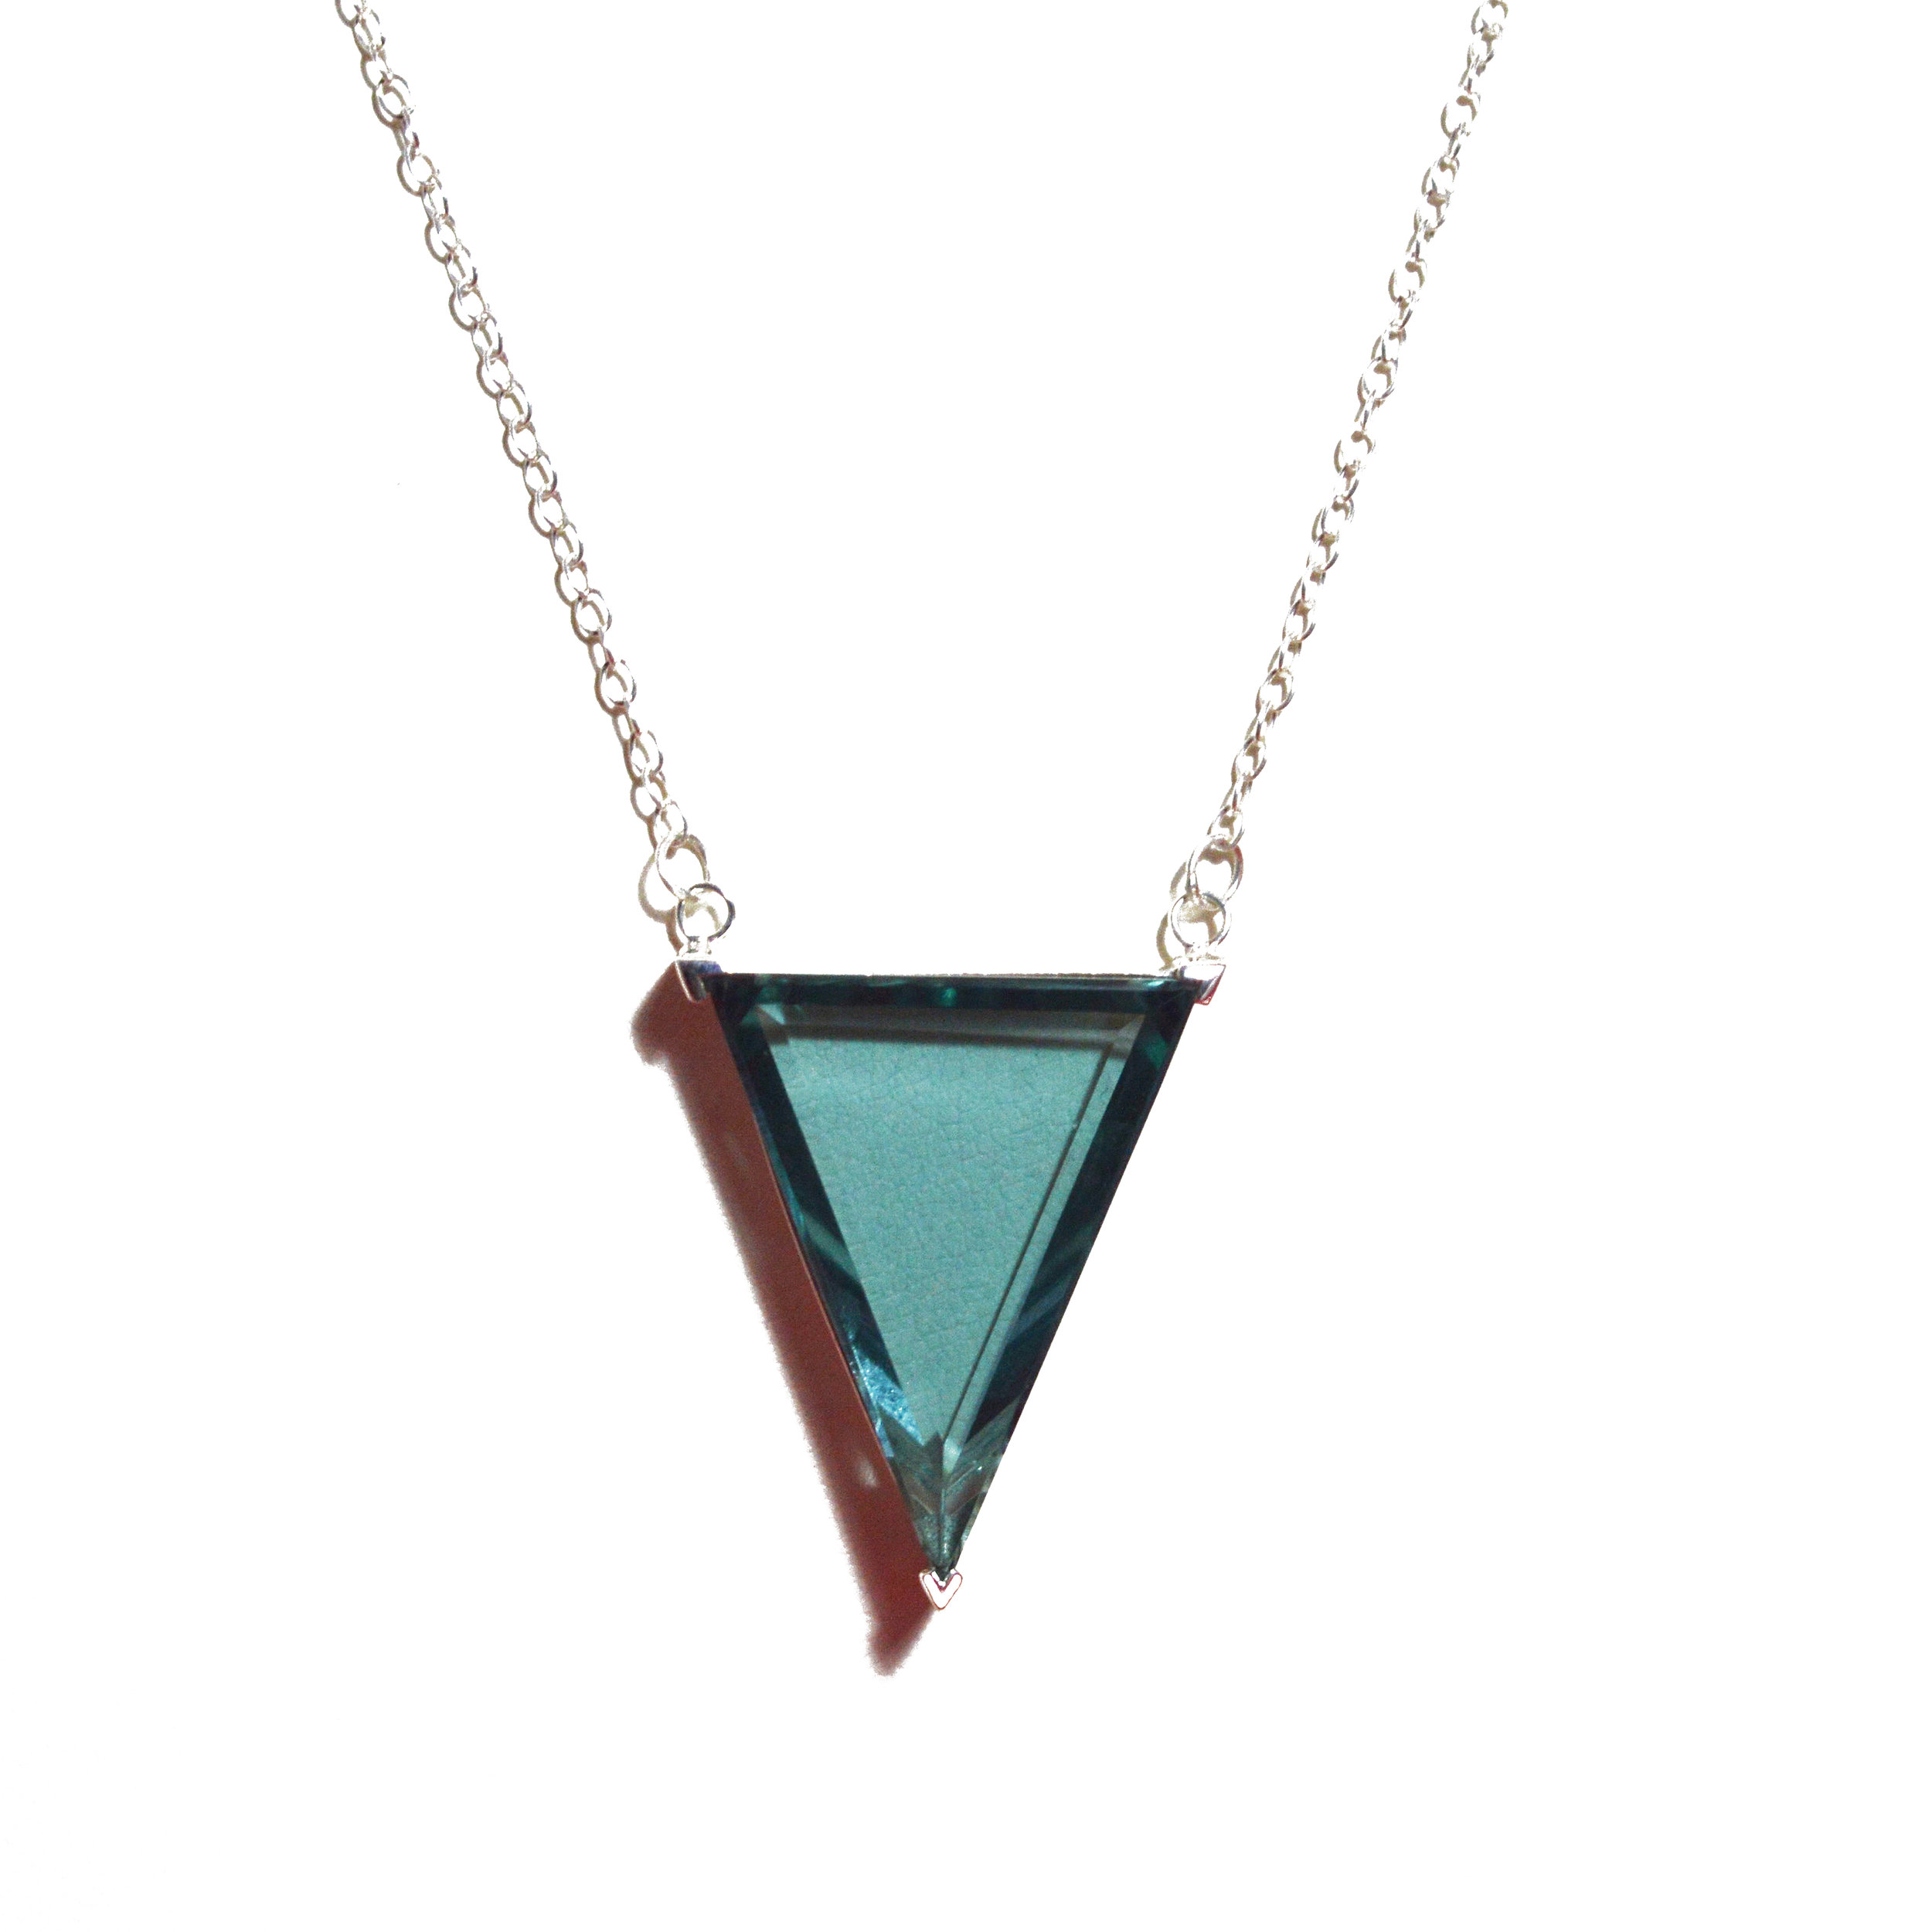 Aurora Necklace Aquamarine Resized V2 Kathryn.jpg